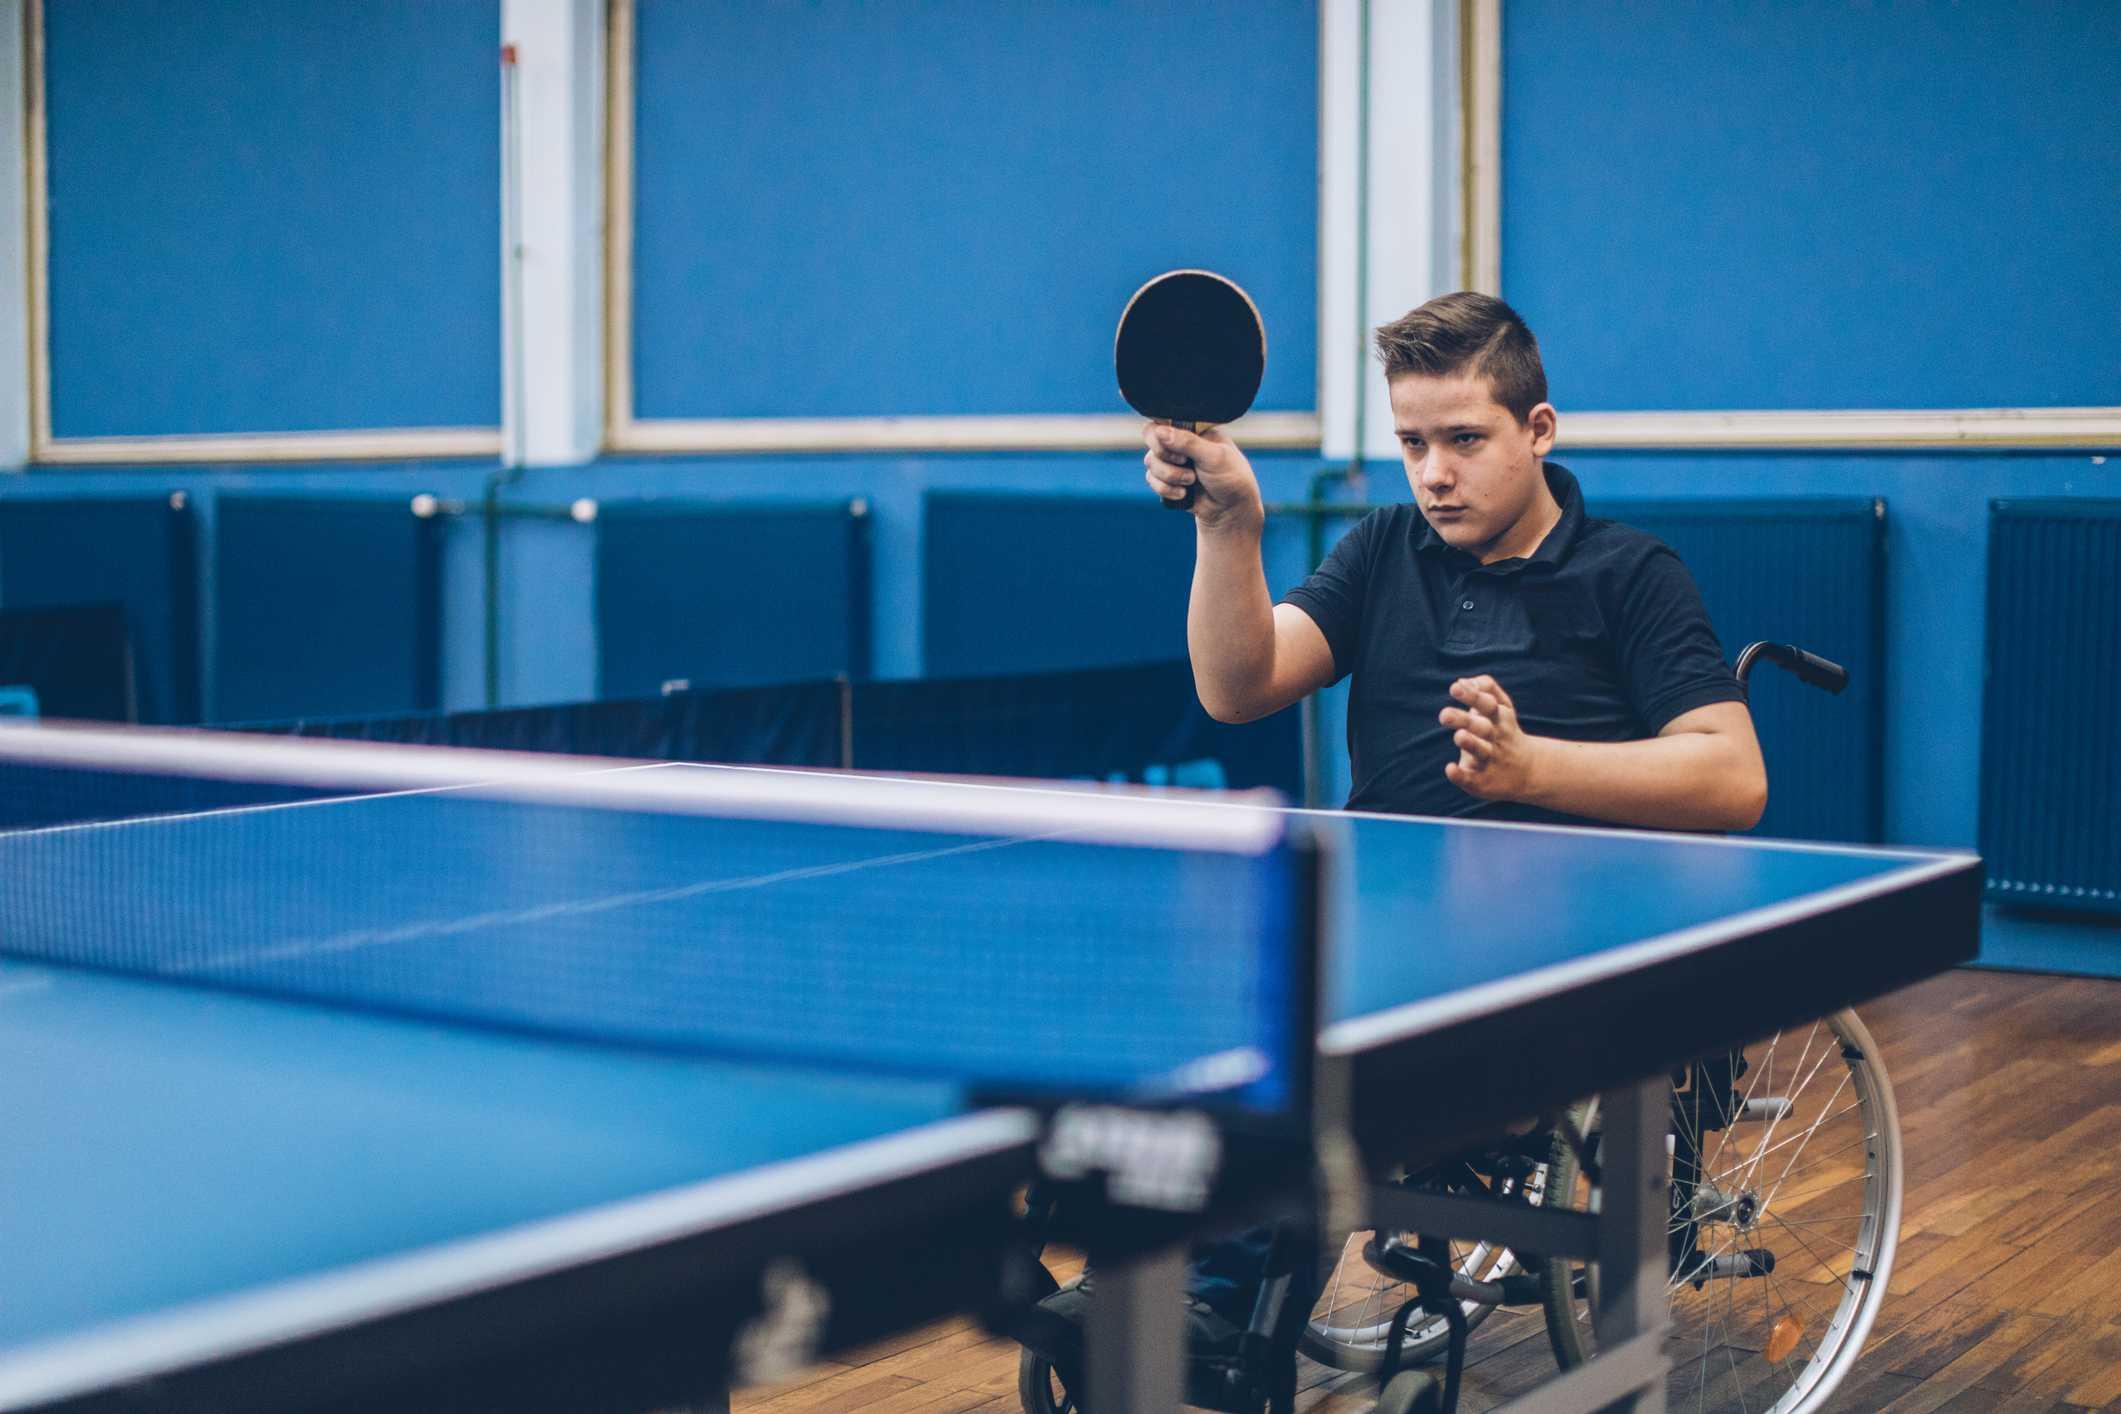 Boy having fun playing table tennis